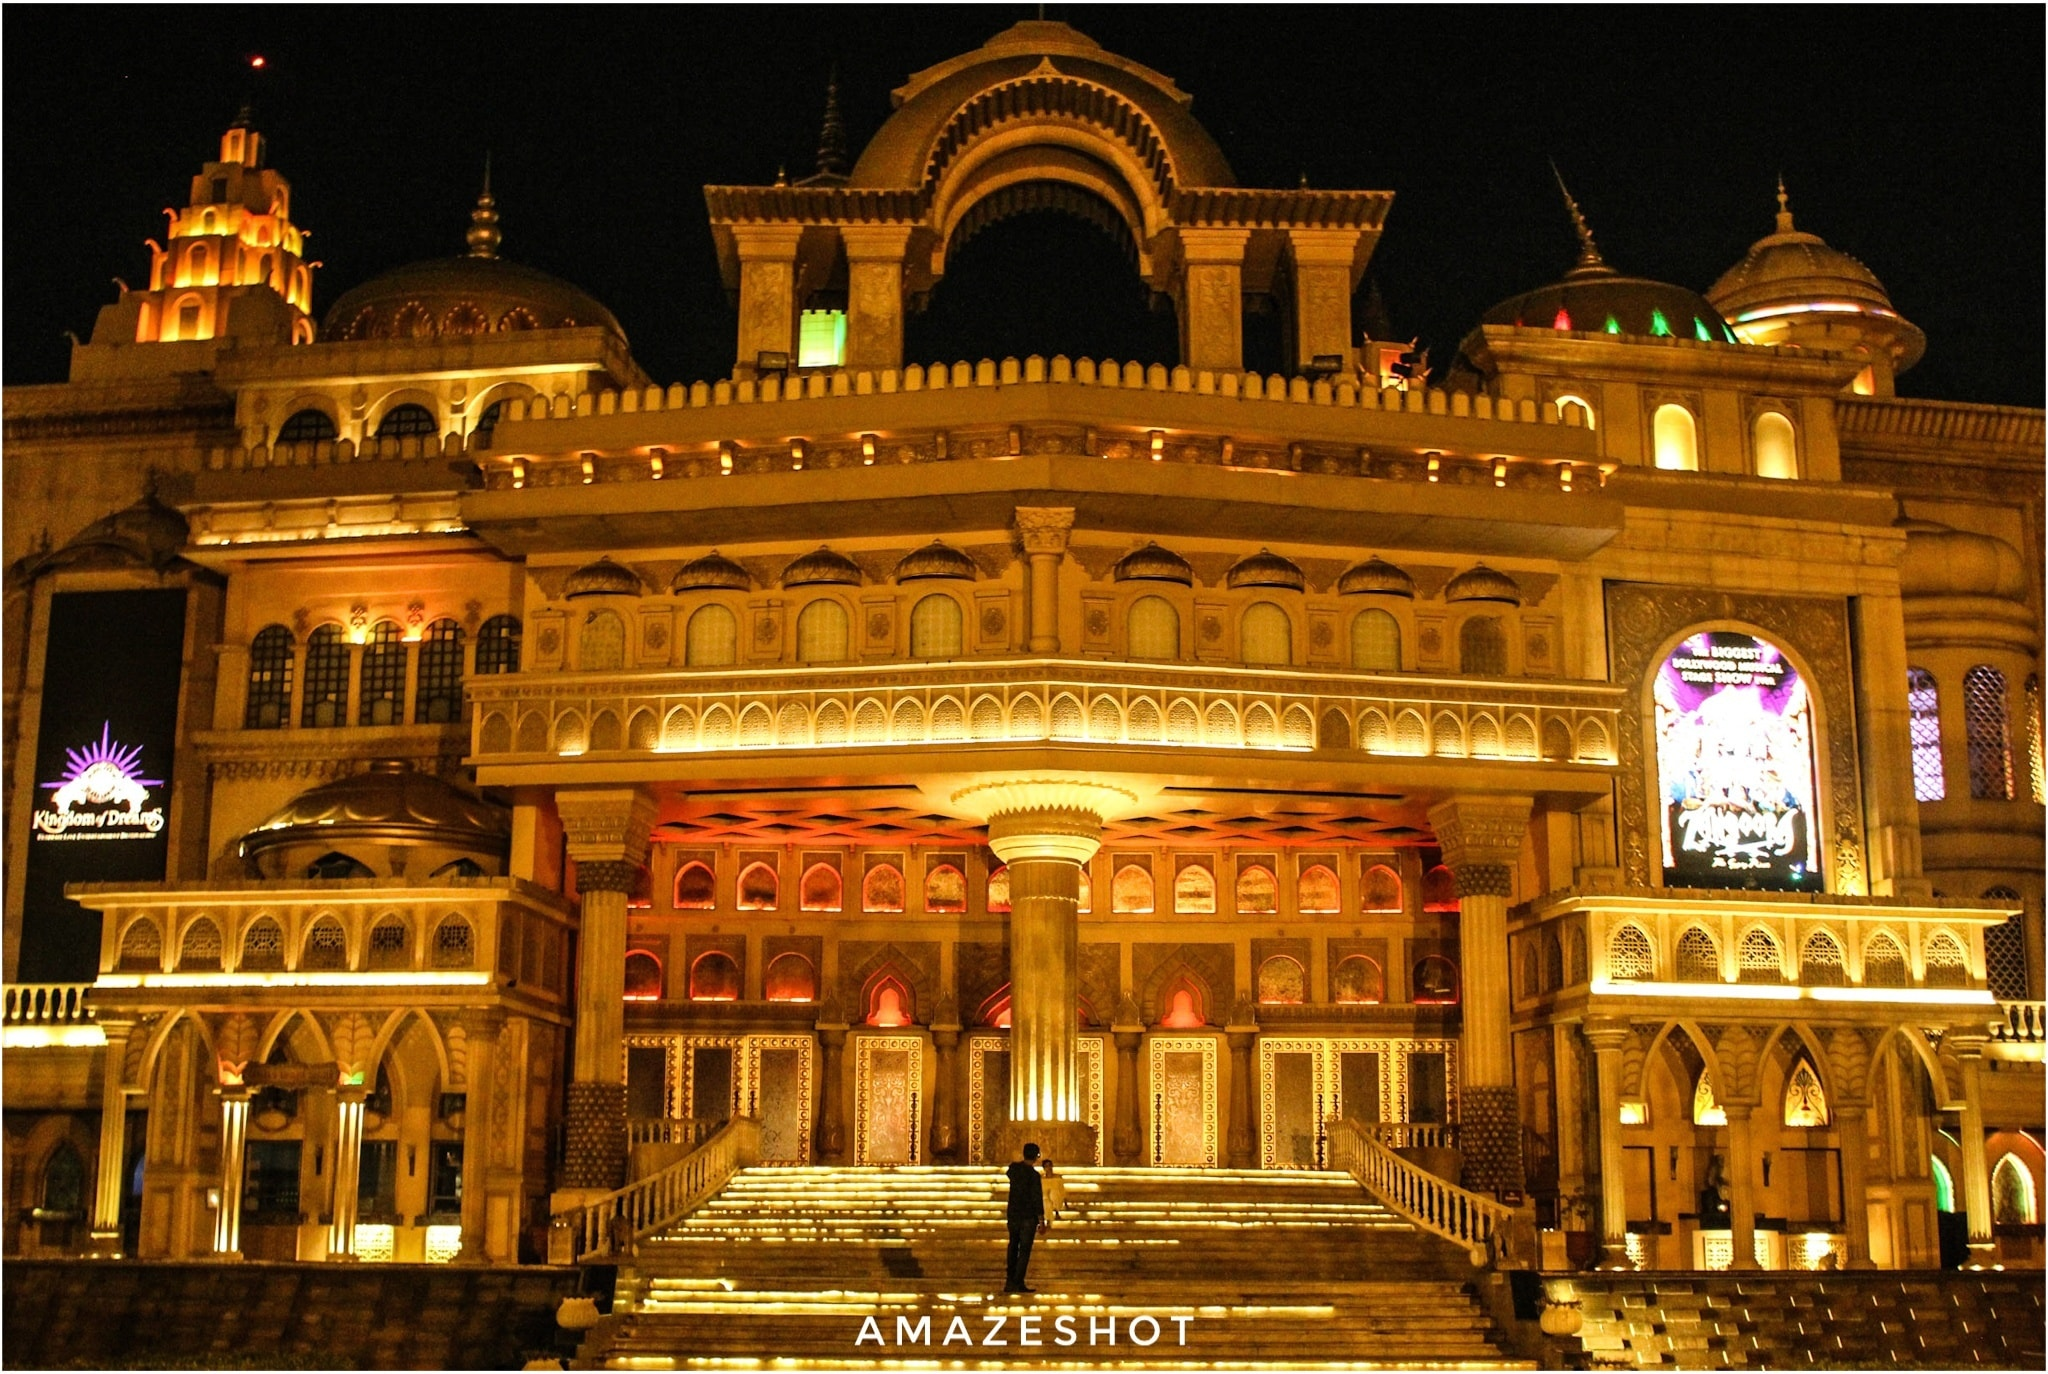 Kingdom Of Dreams in India